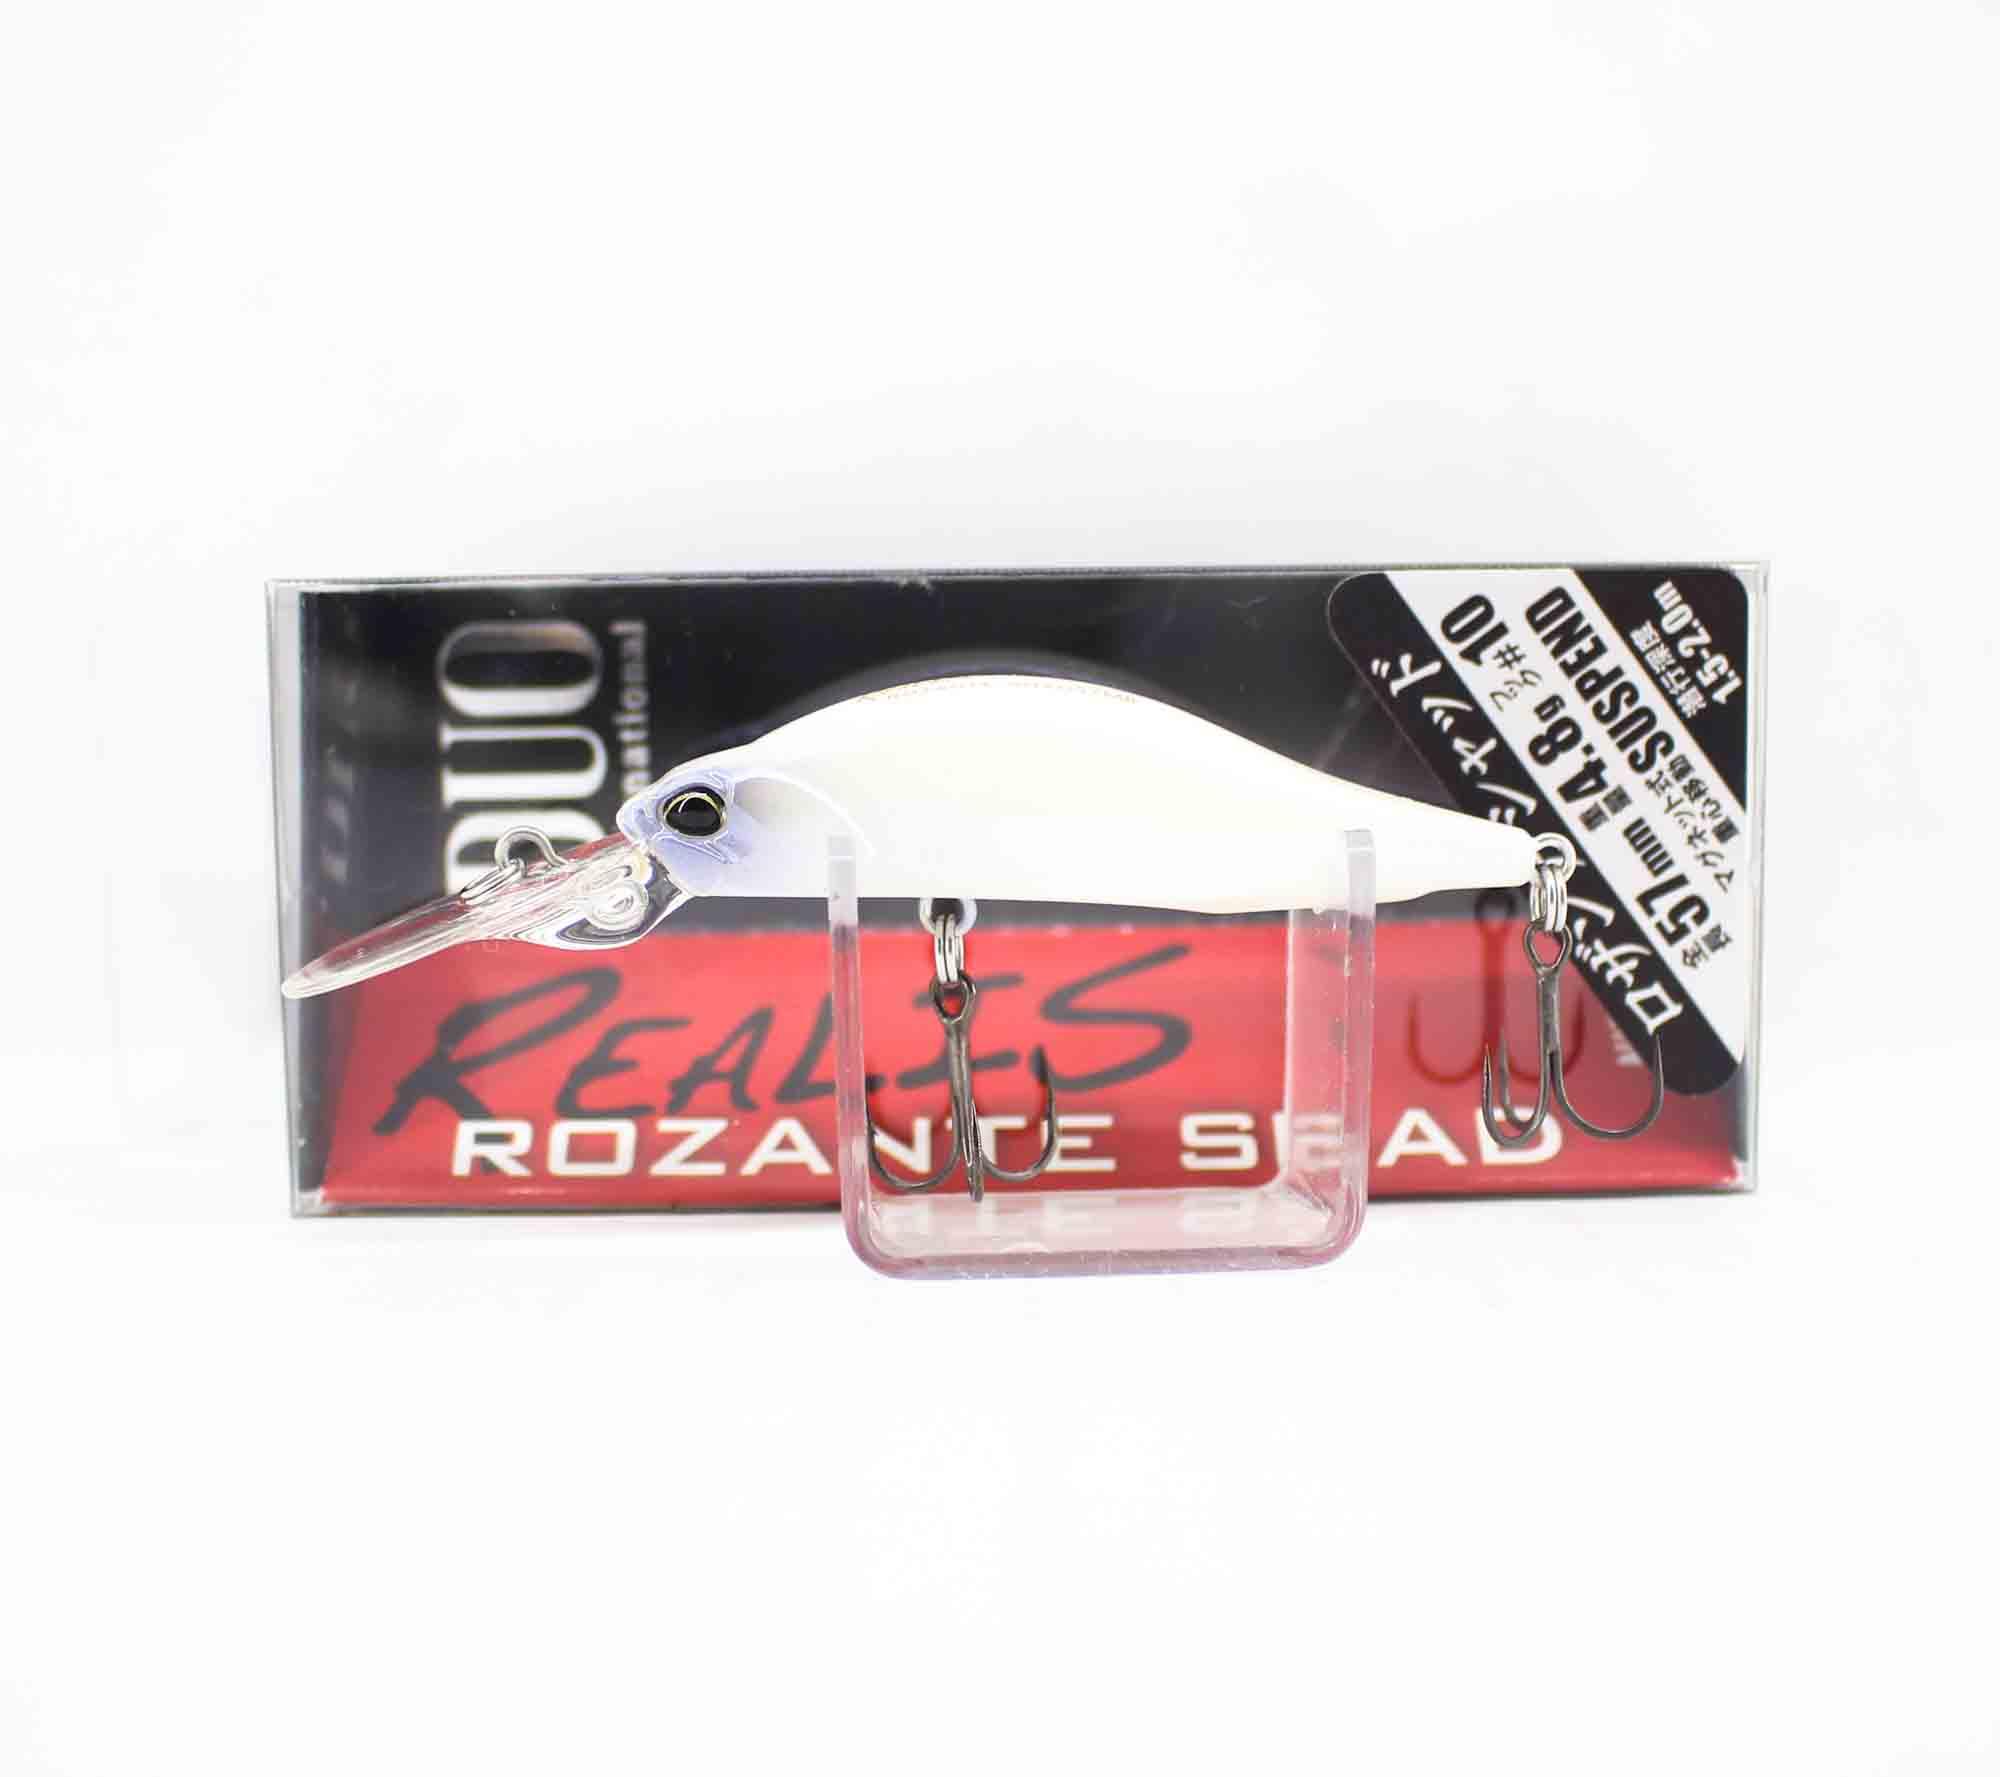 Duo Realis Rozante Shad 57 MR Suspend Lure ACC3008 (9697)